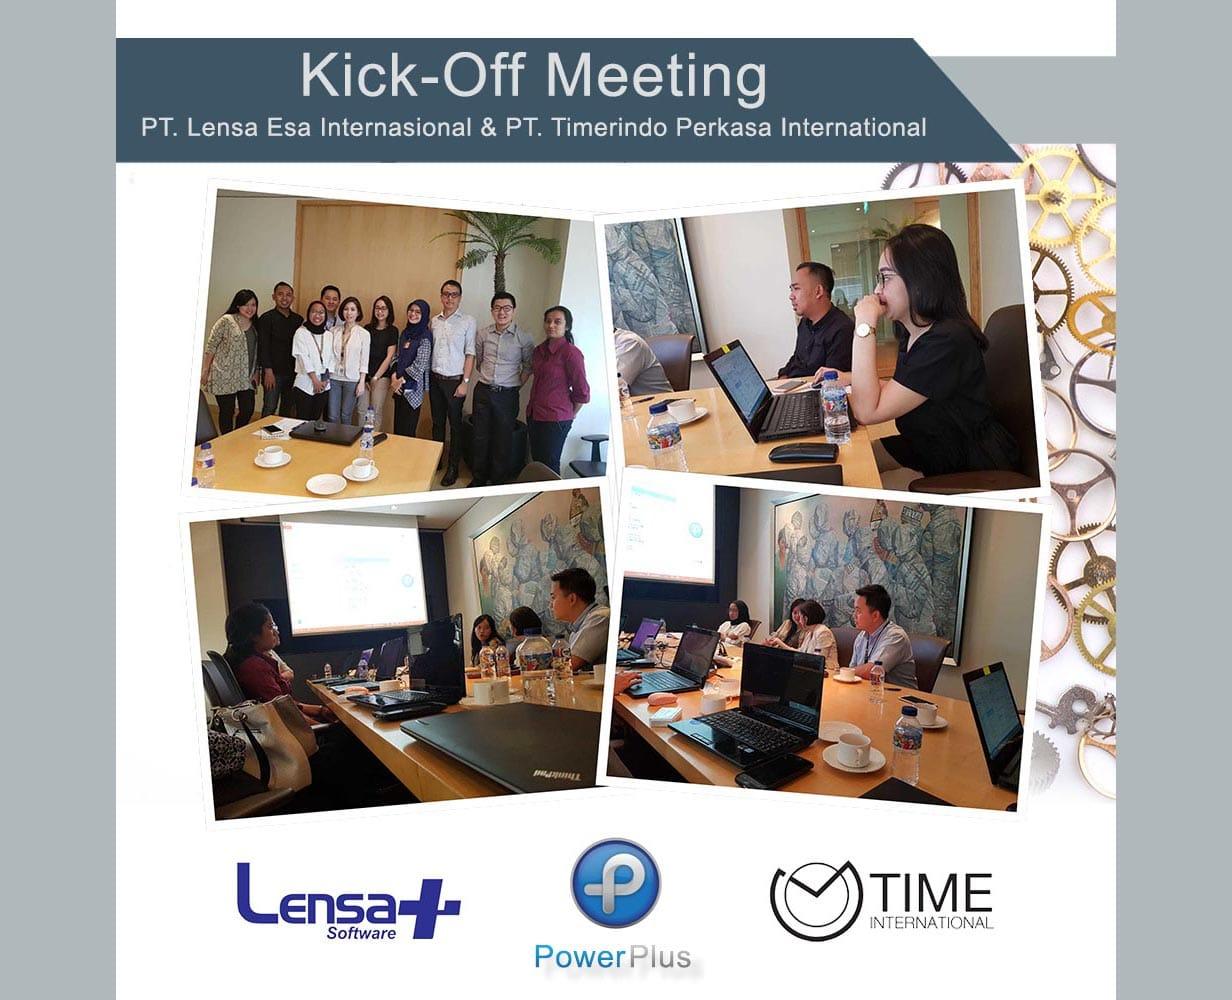 Kick-off Meeting PT. Lensa Esa Internasional & PT. Timerindo Perkasa International